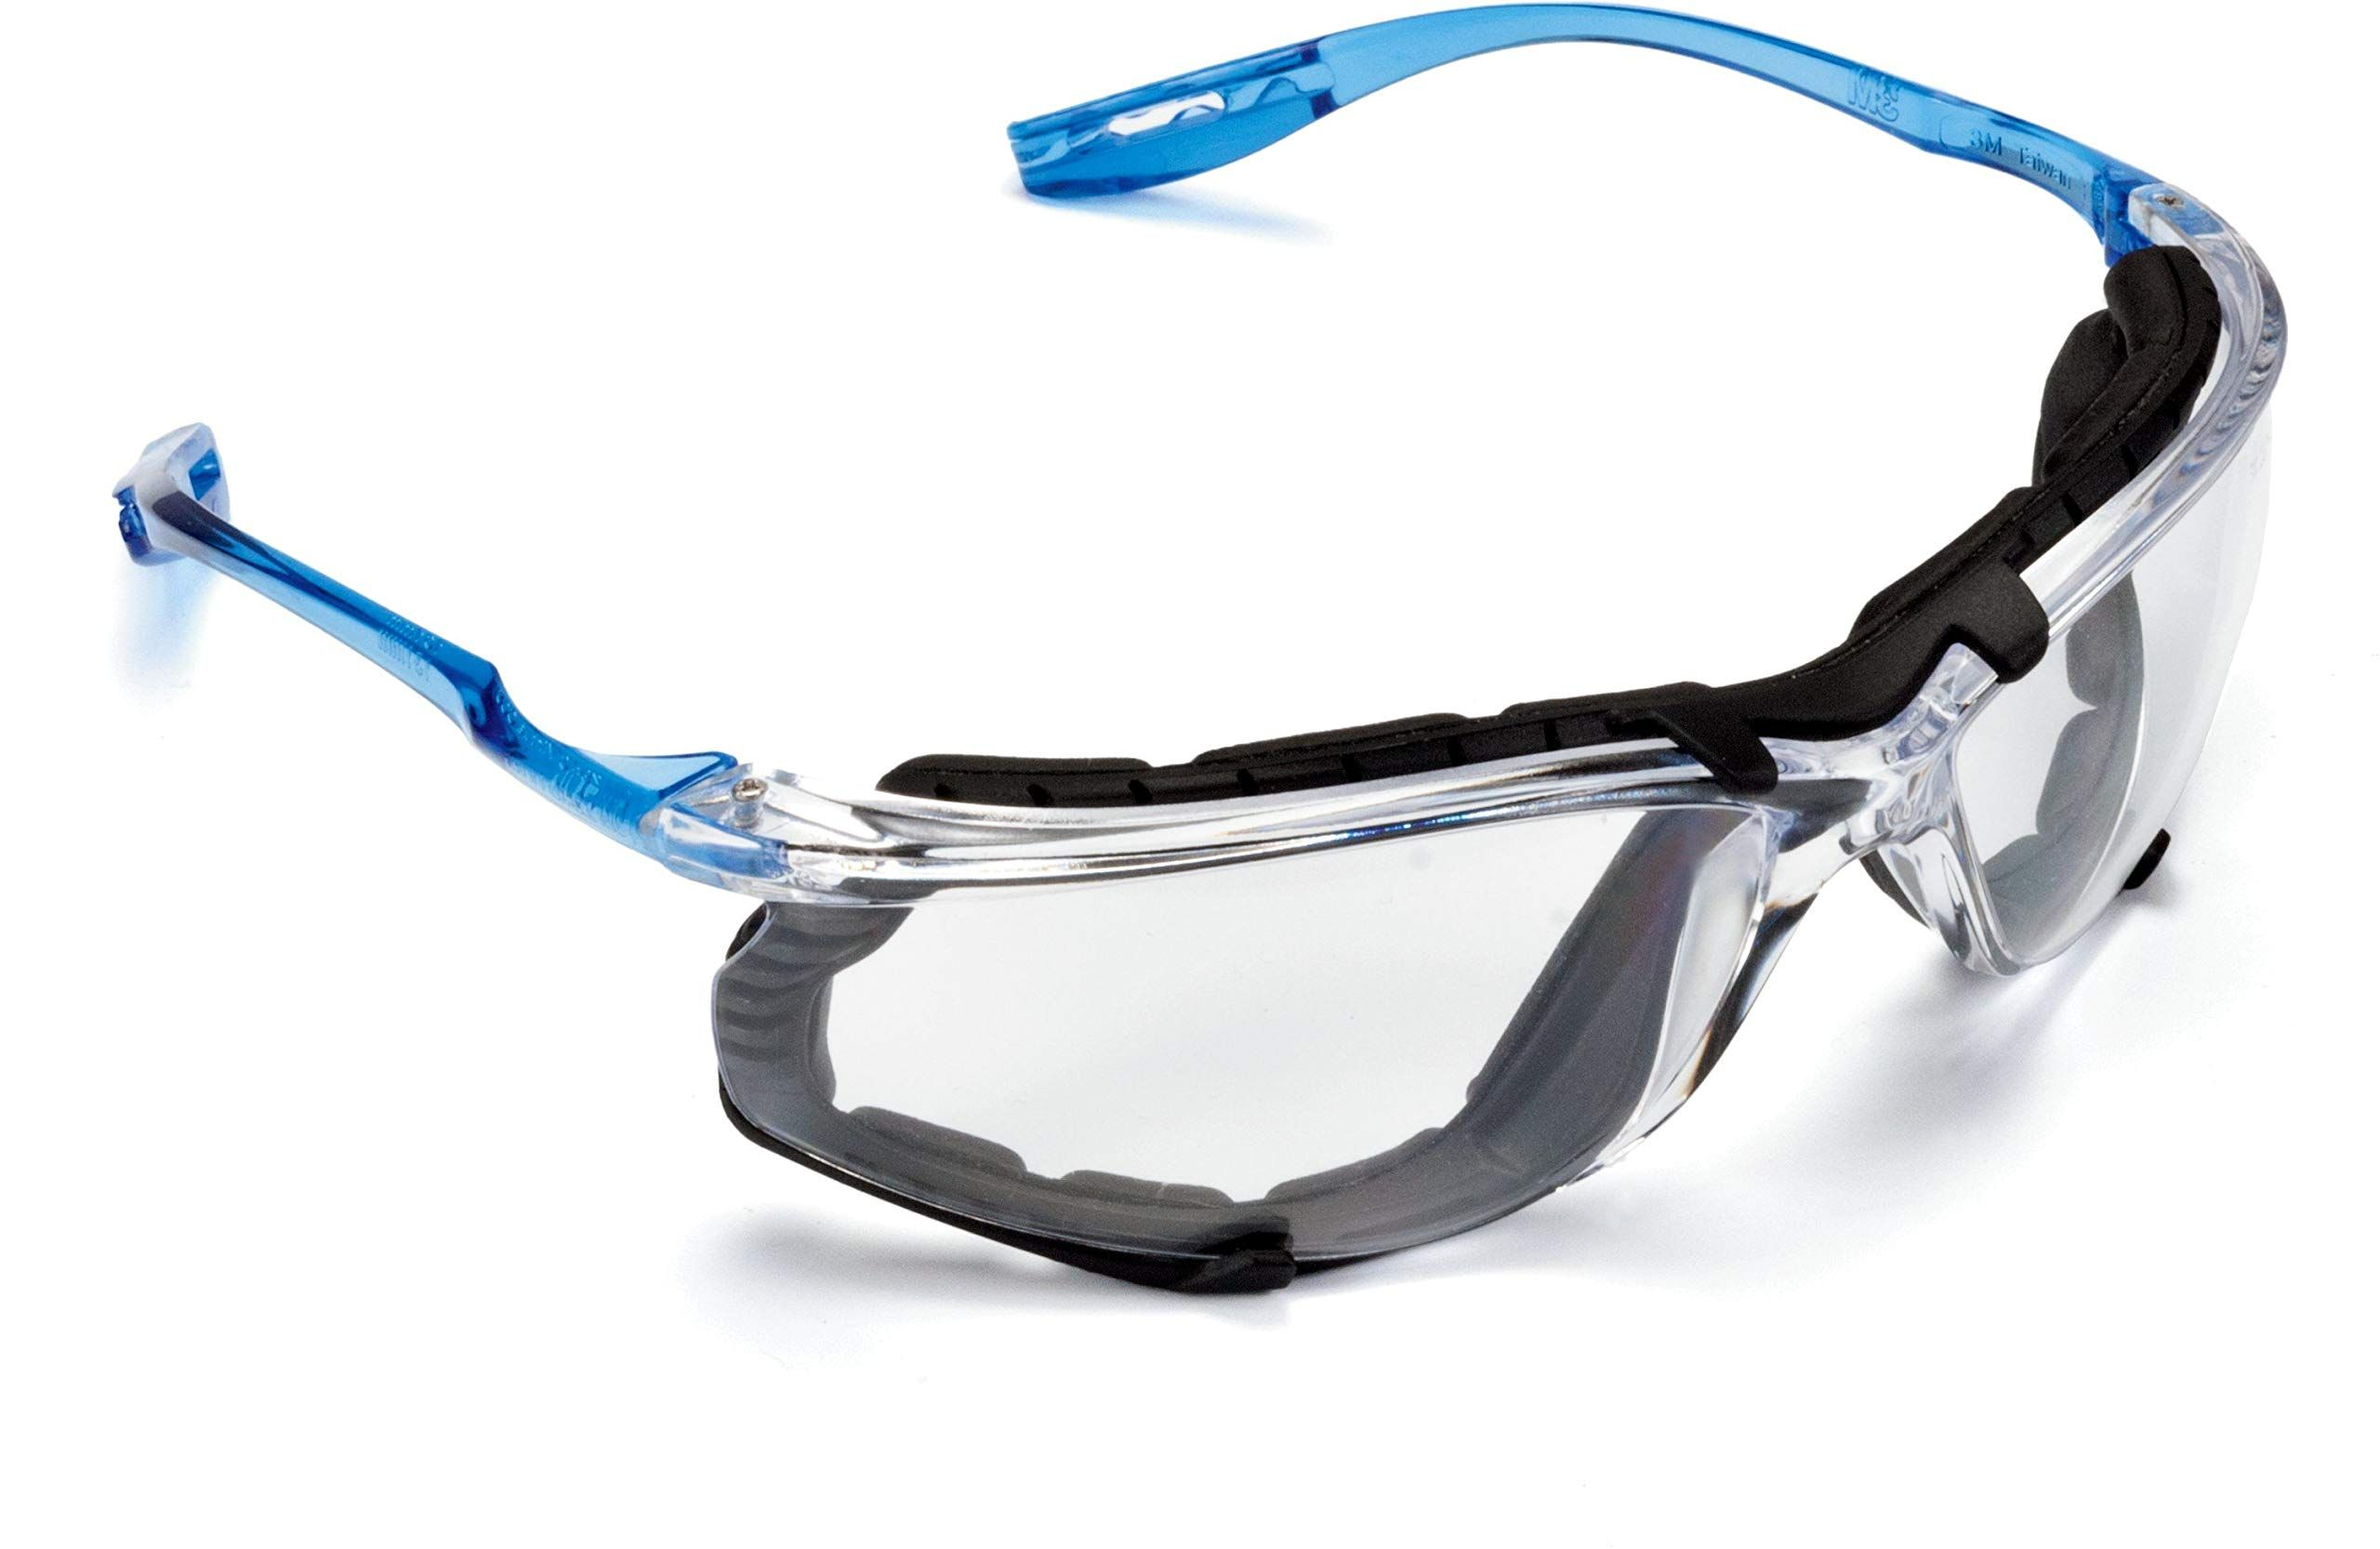 3M Safety Glasses, Virtua CCS Protective Eyewear 11872